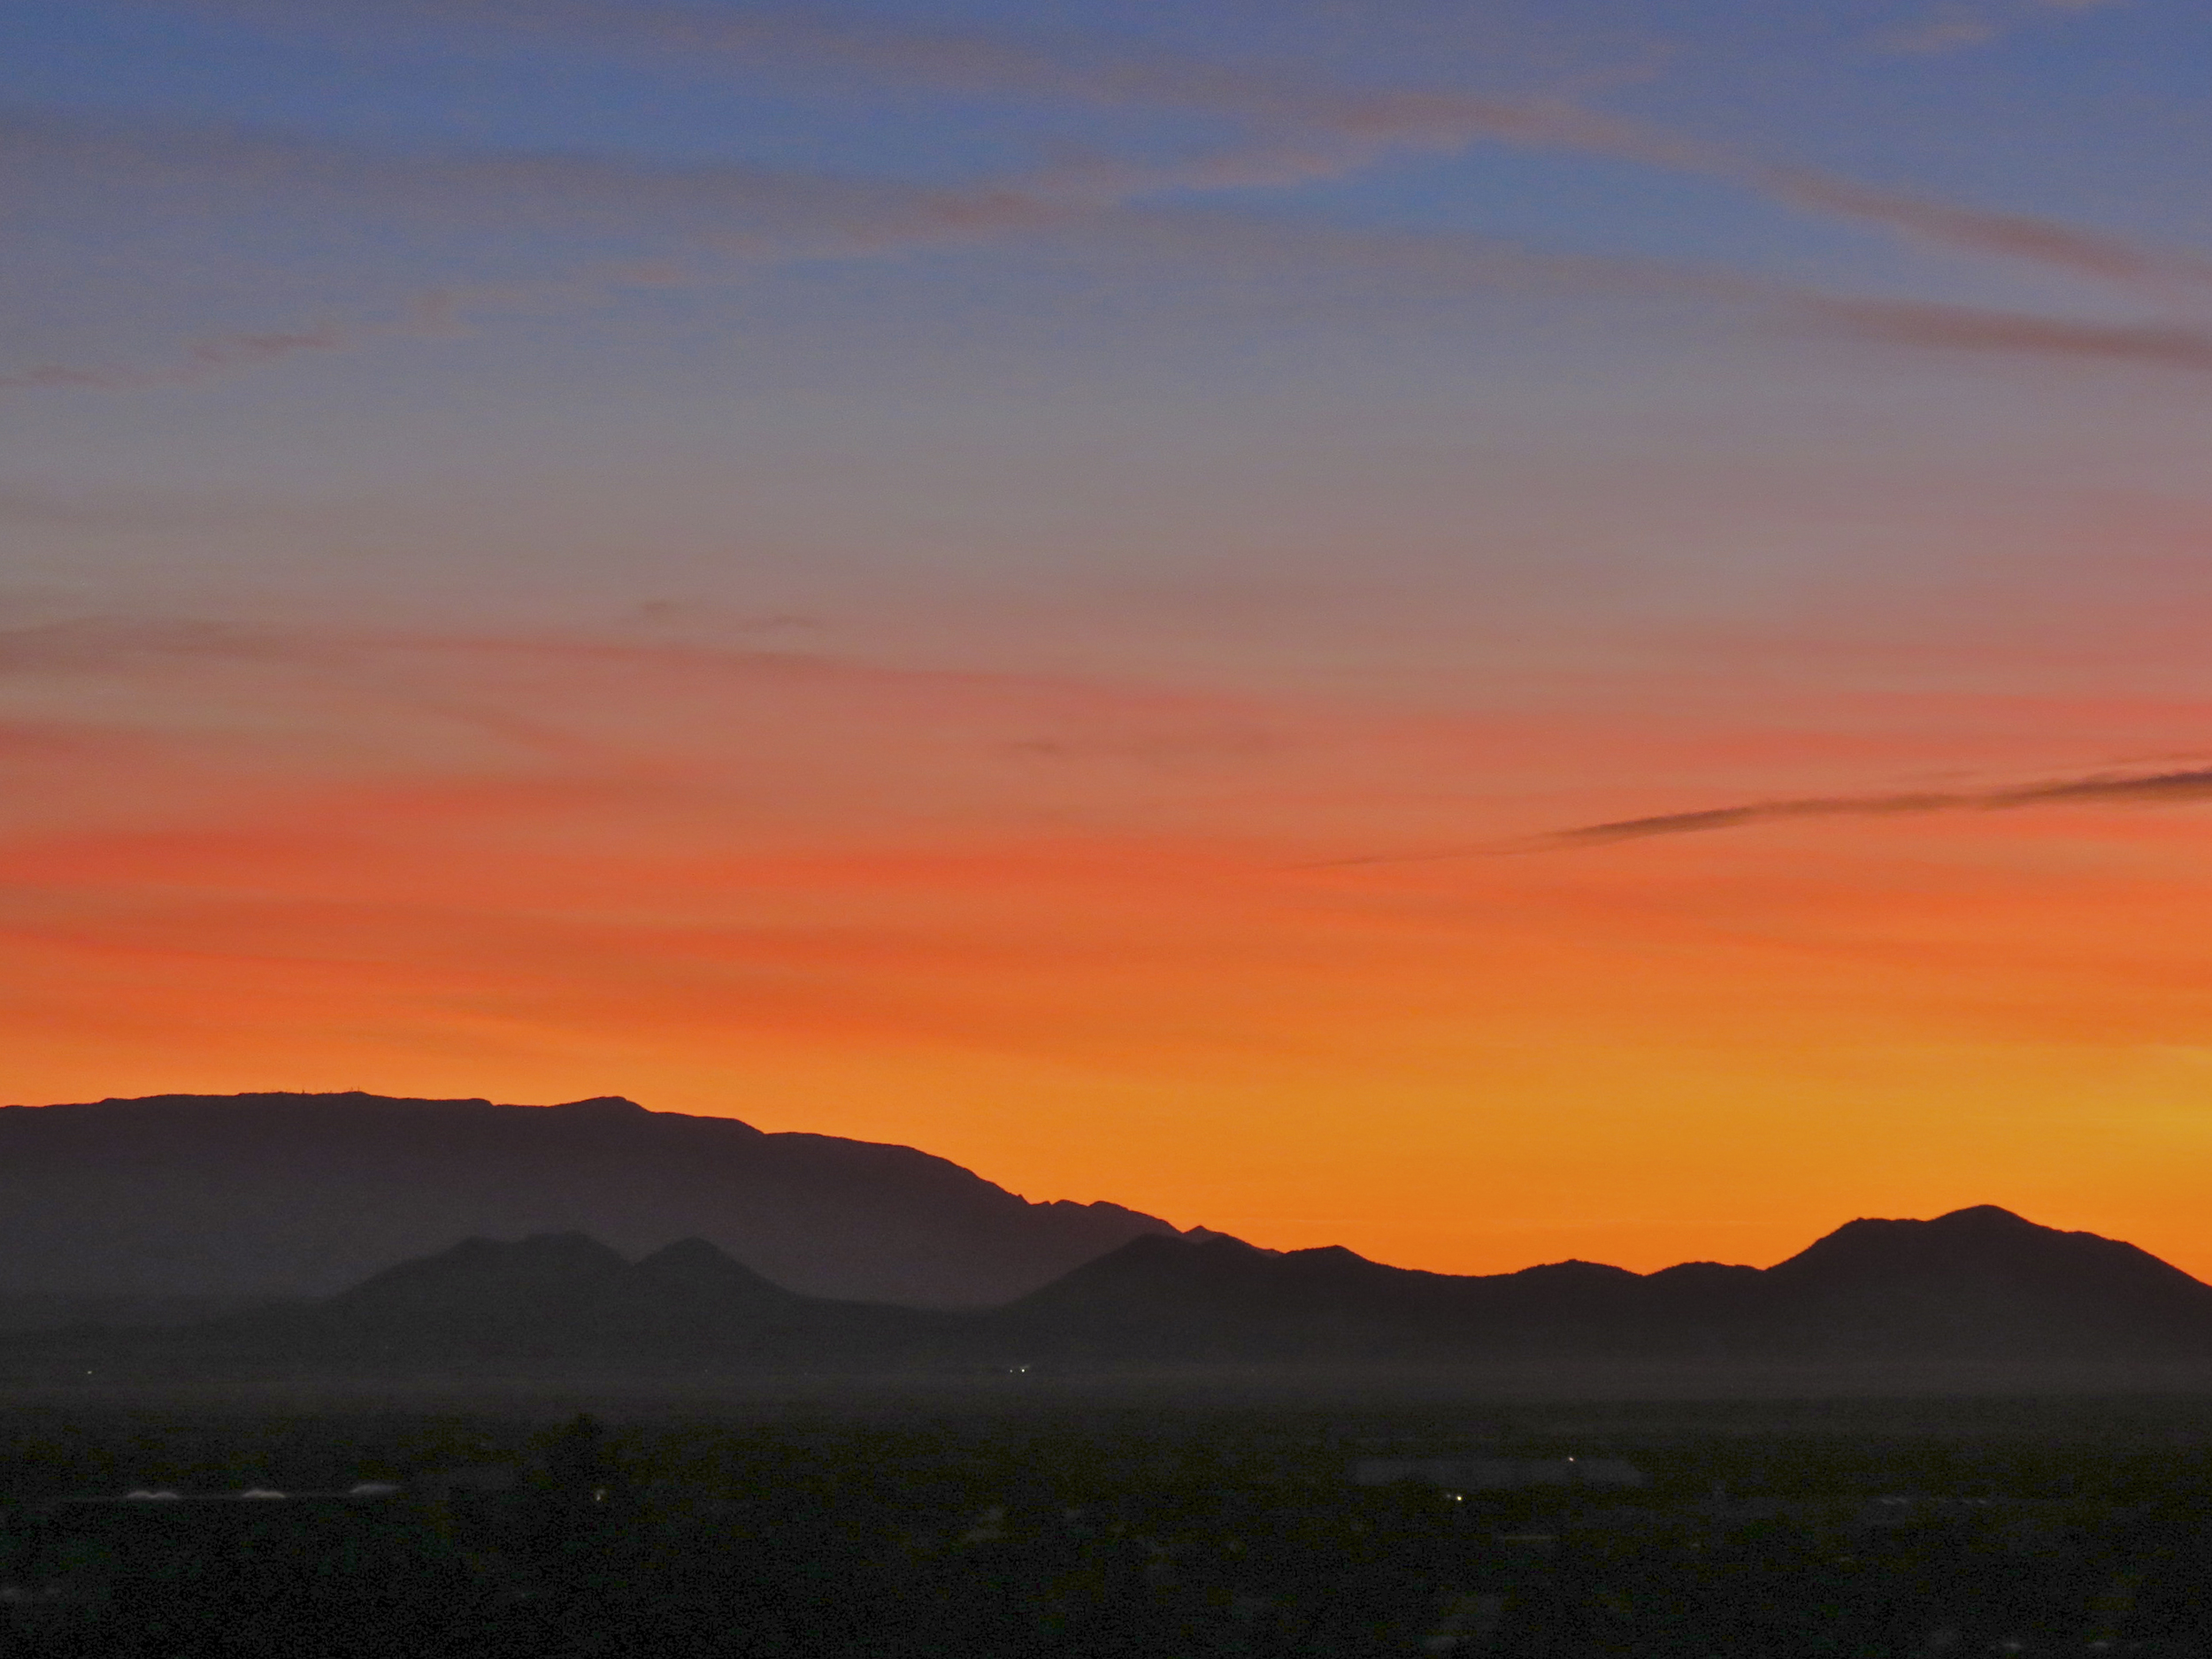 NE_SunsetSkyline_027.jpg